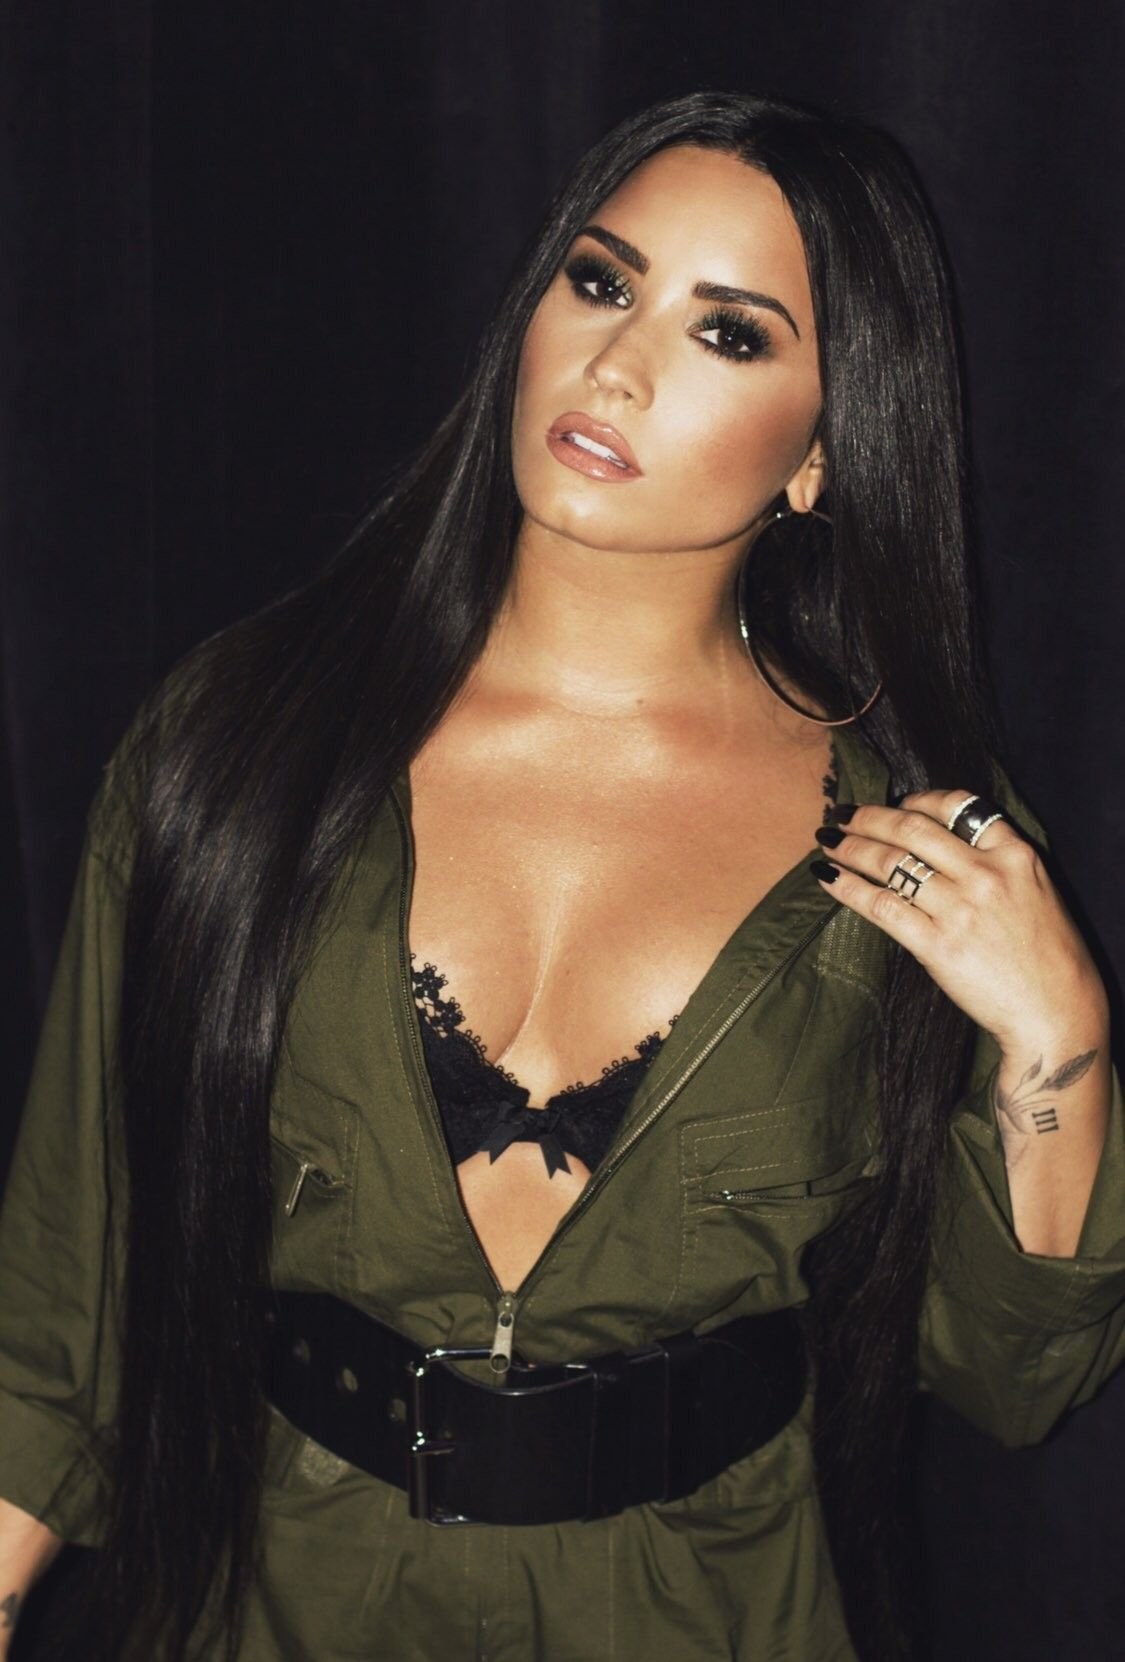 Paparazzi Demetria Lovato nudes (44 photos), Sexy, Fappening, Feet, braless 2020